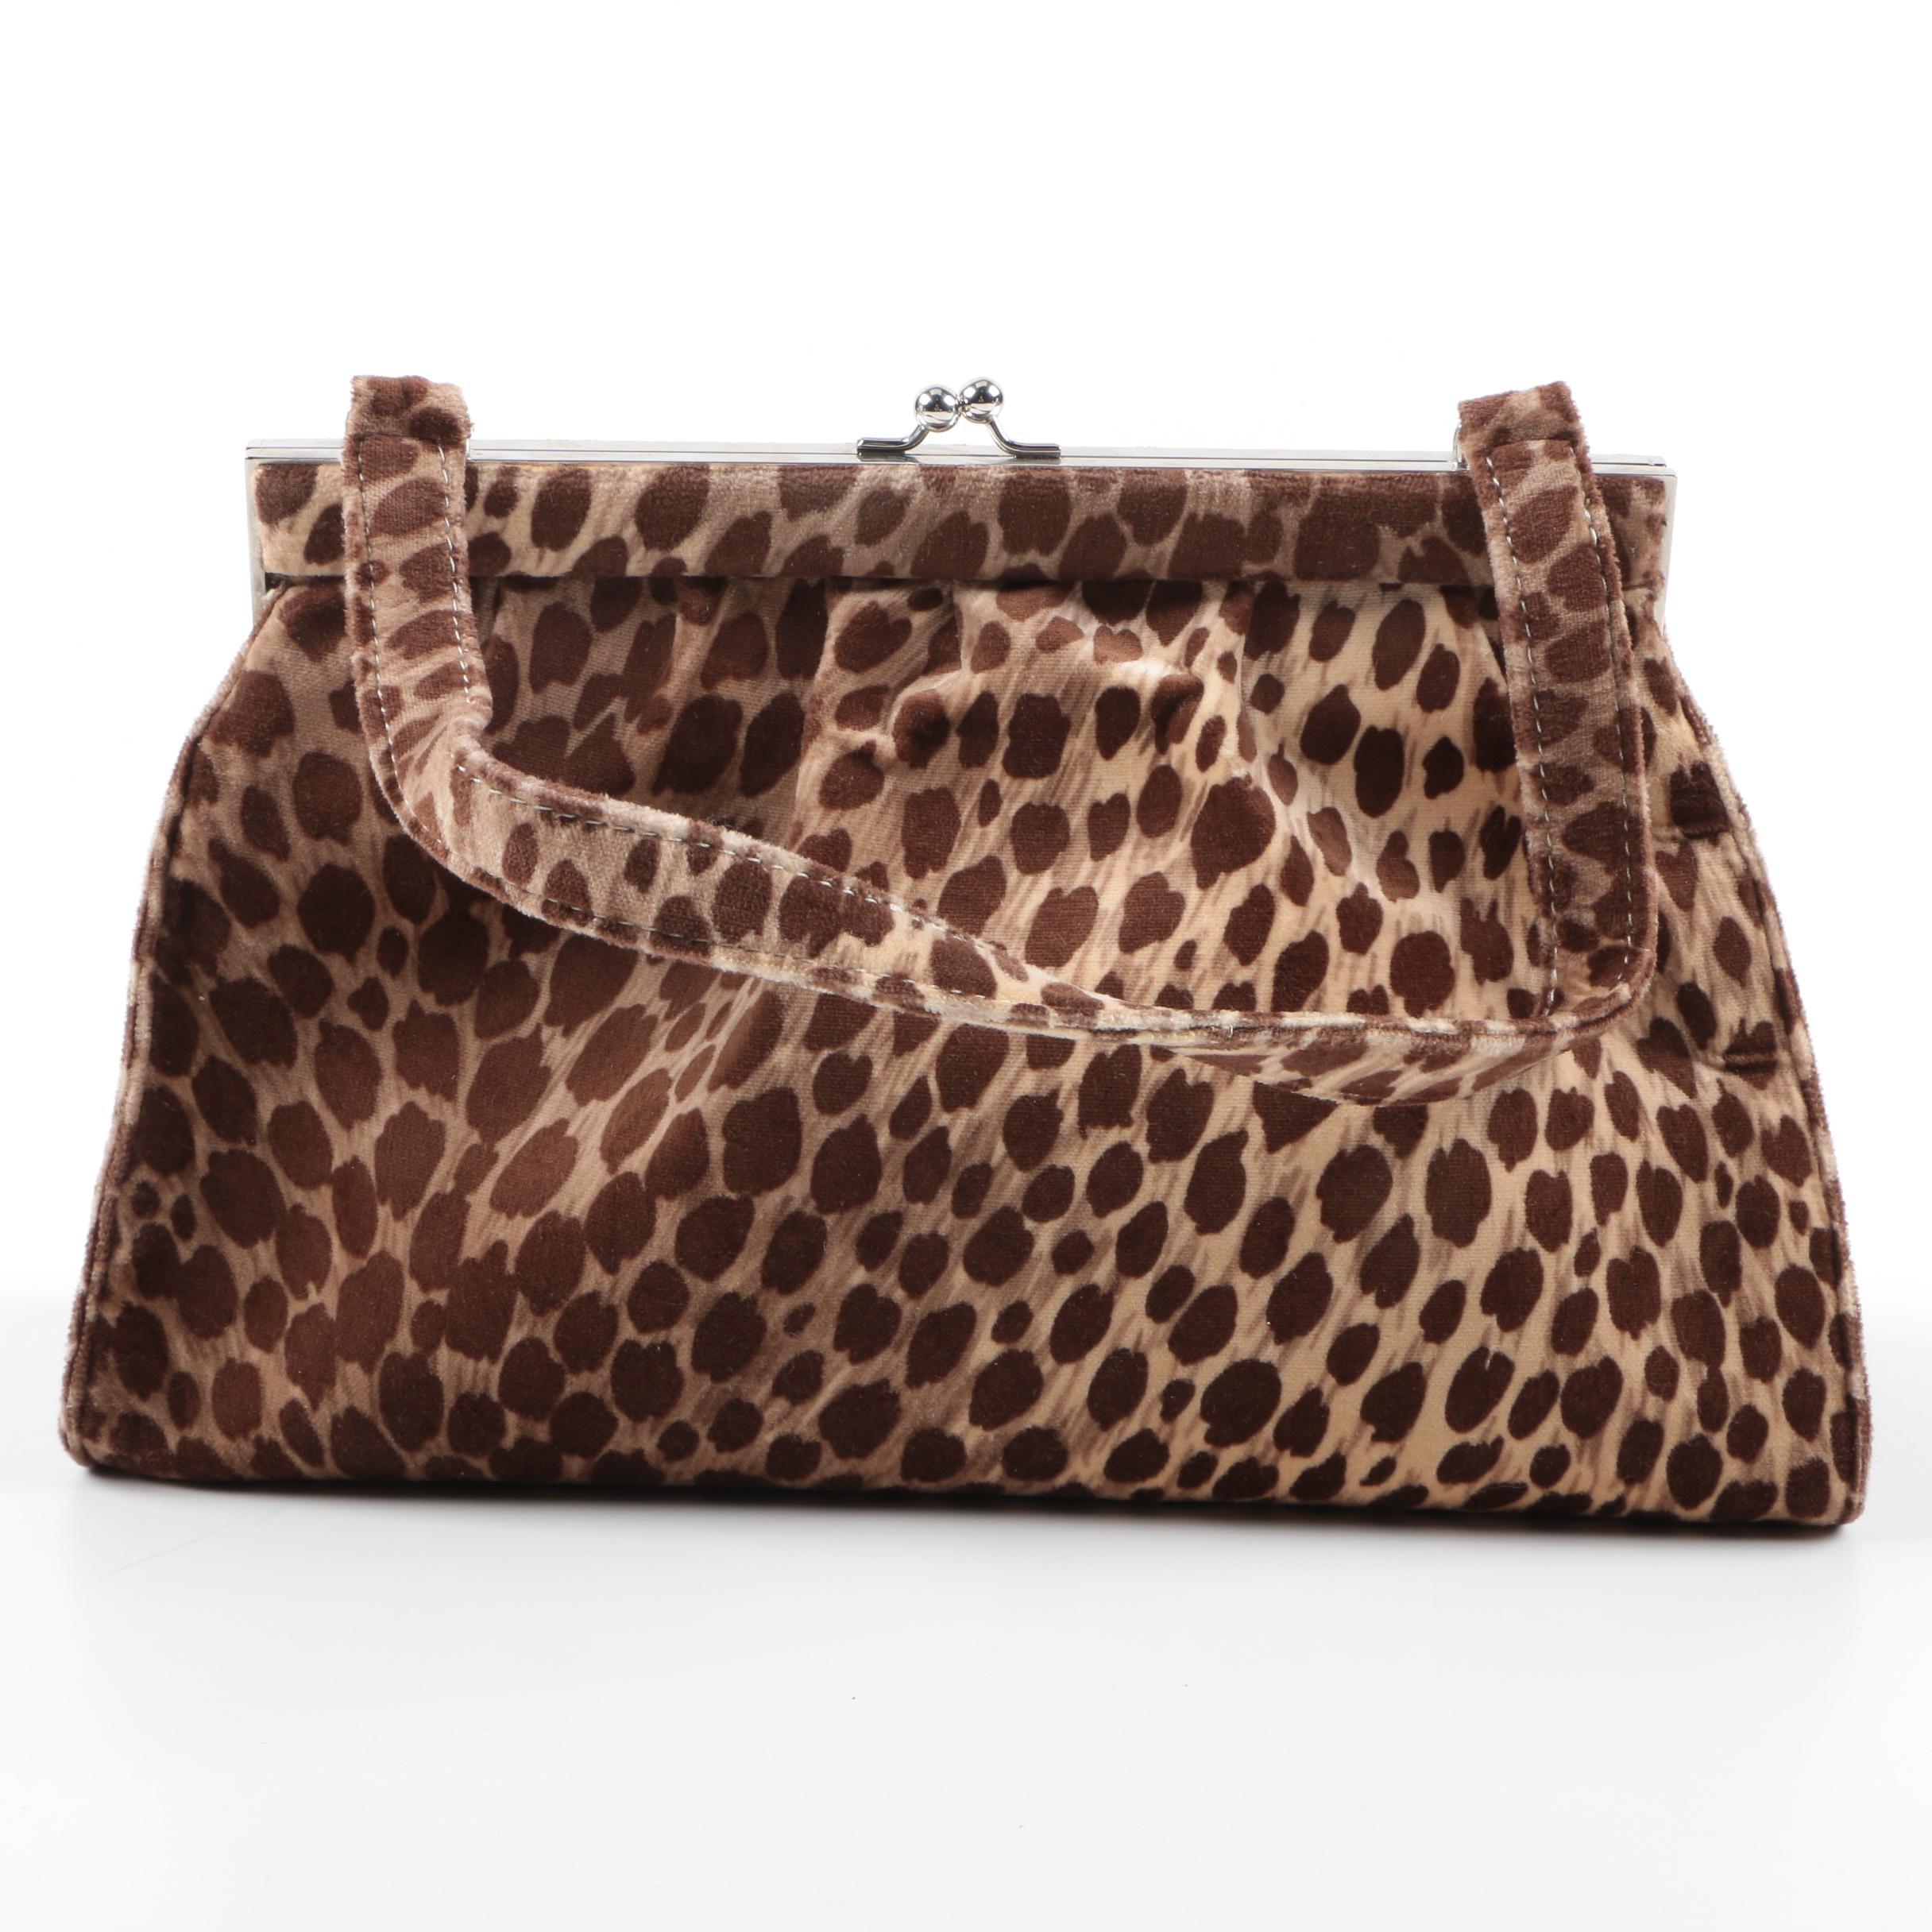 Dolce & Gabbana Cheetah Print Purse